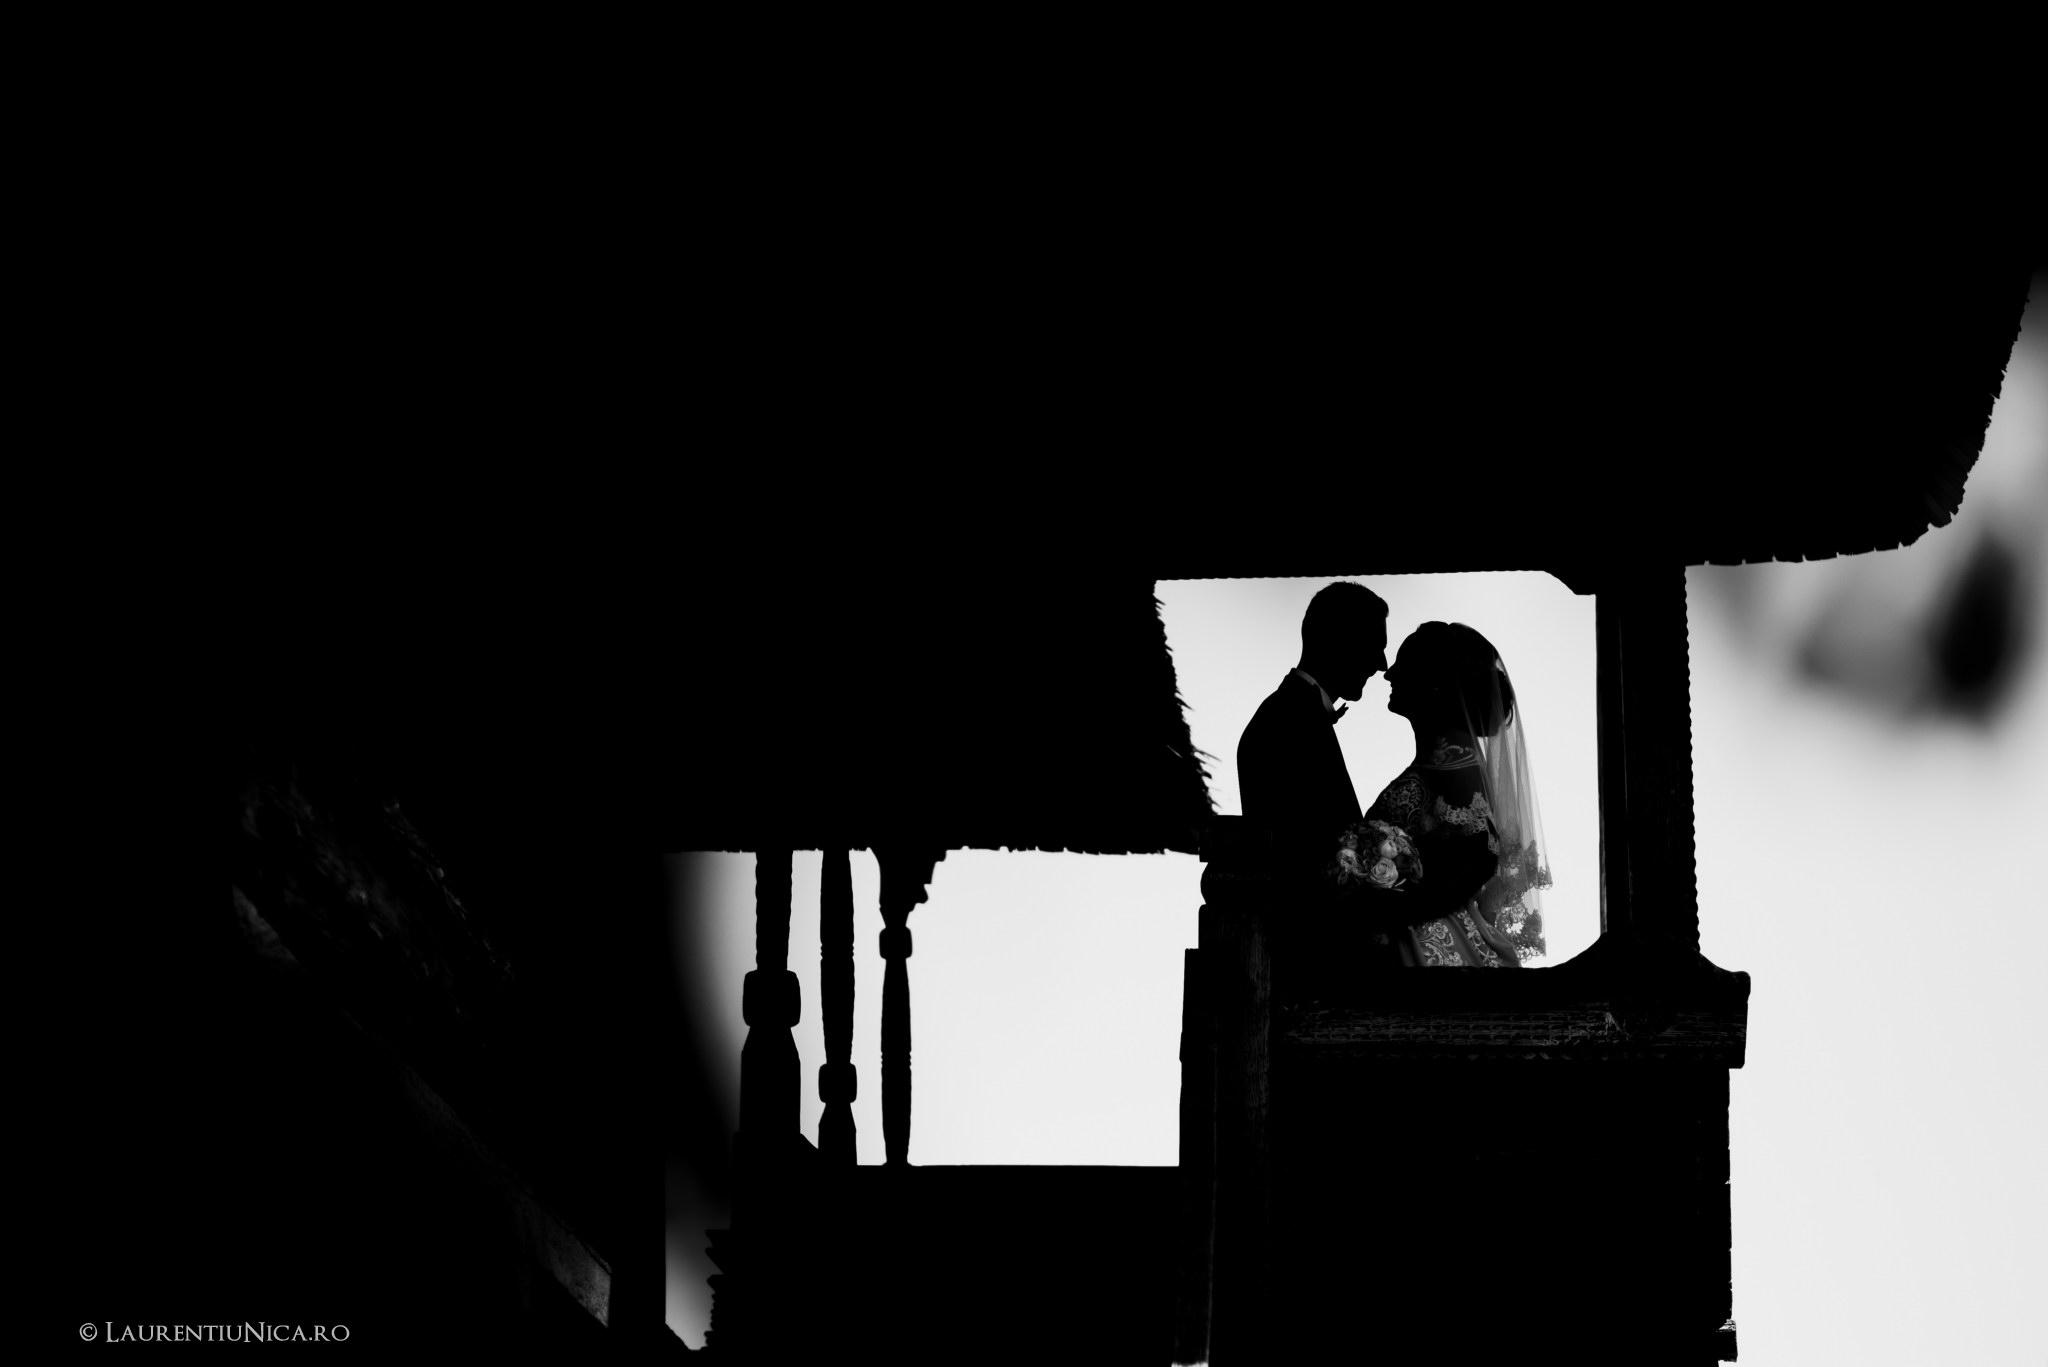 daiana si madalin fotograf nunta laurentiu nica targu jiu gorj 13 - Daiana & Madalin | Fotografii nunta | Targu-Jiu | Gorj